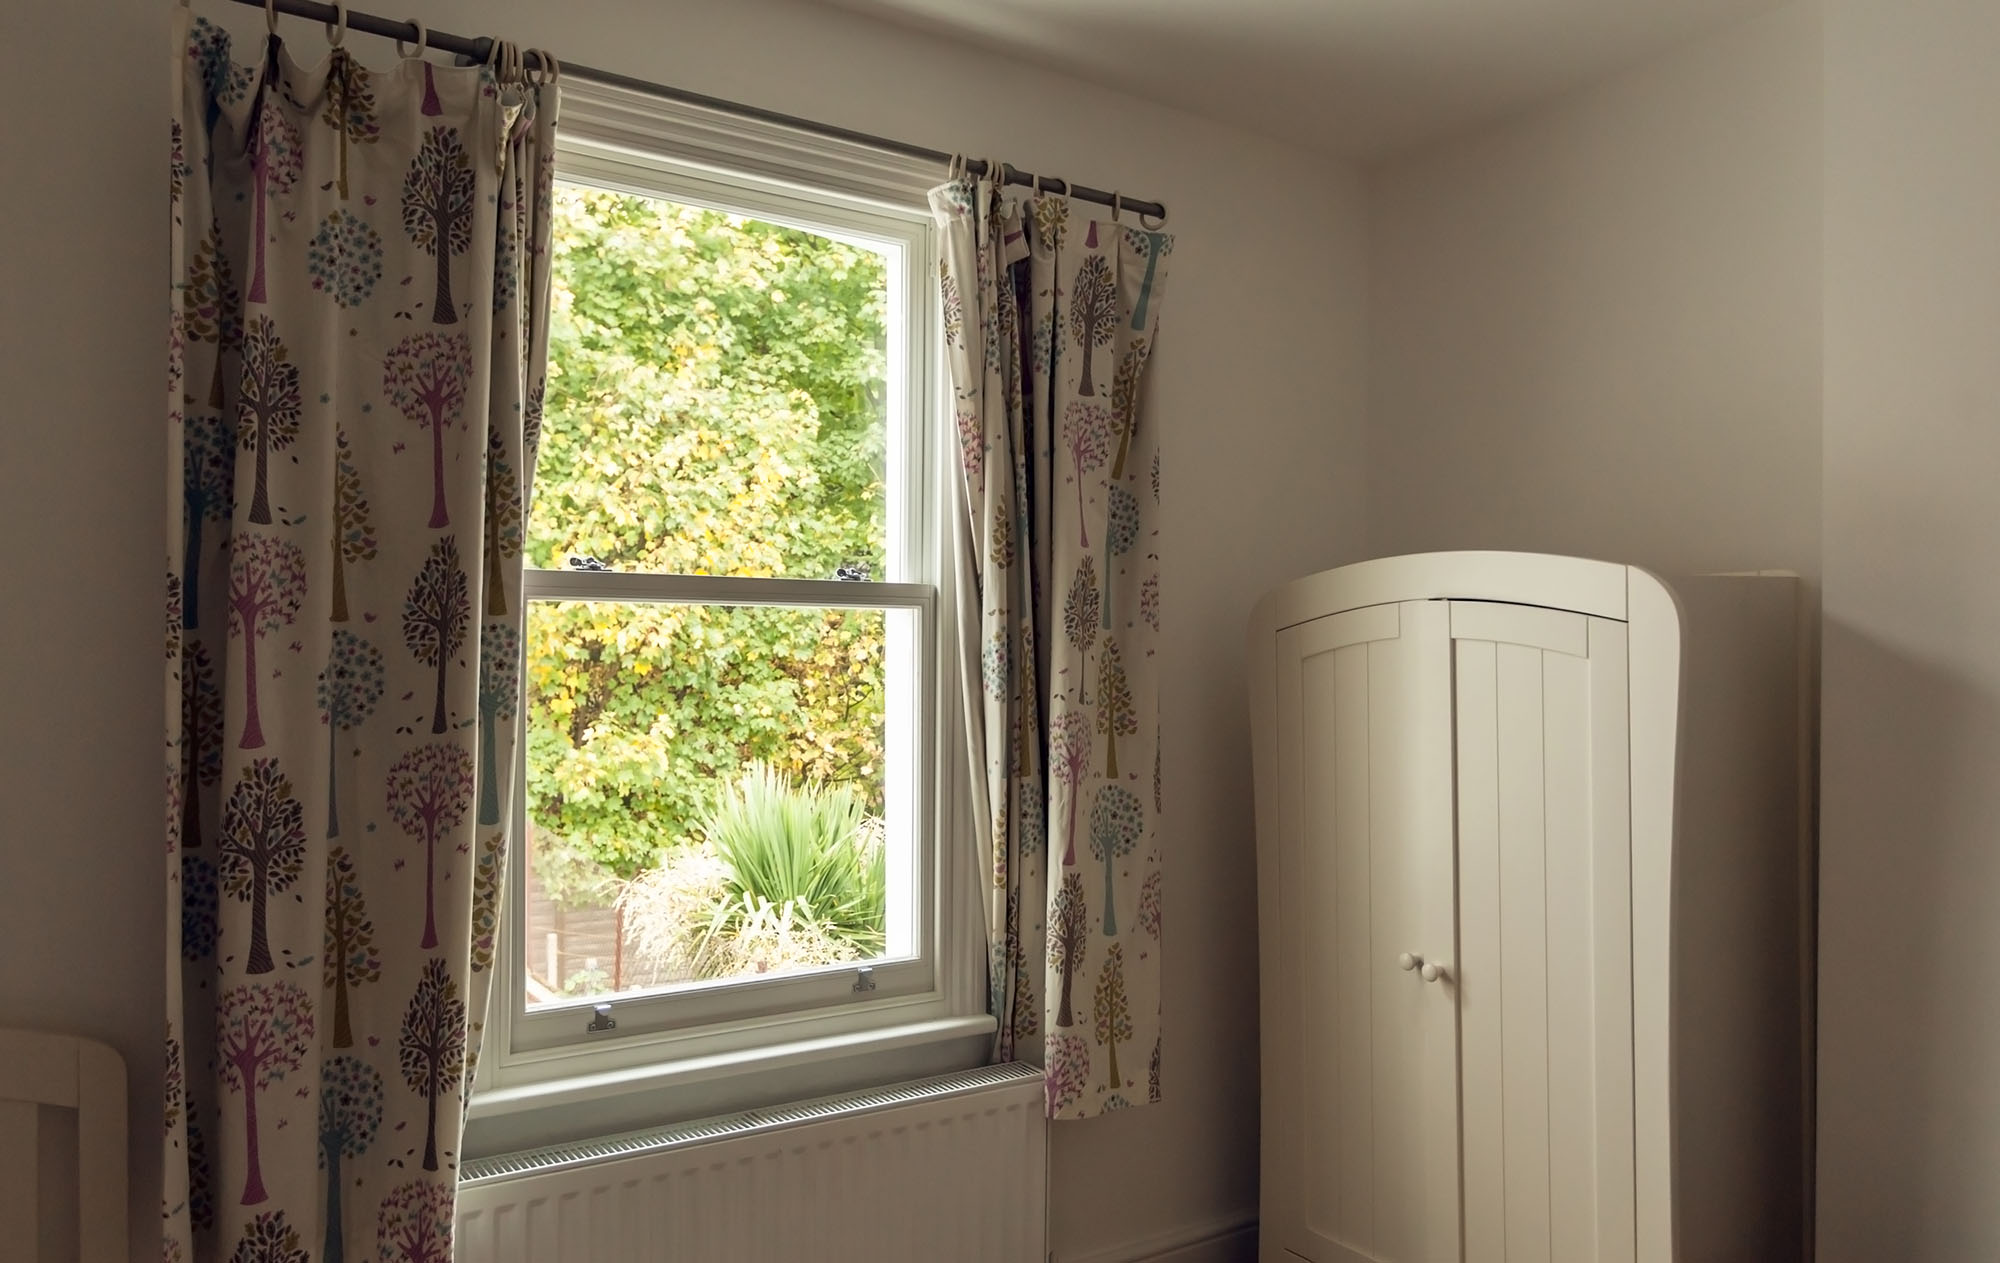 nica-design-london-shash-windows-7